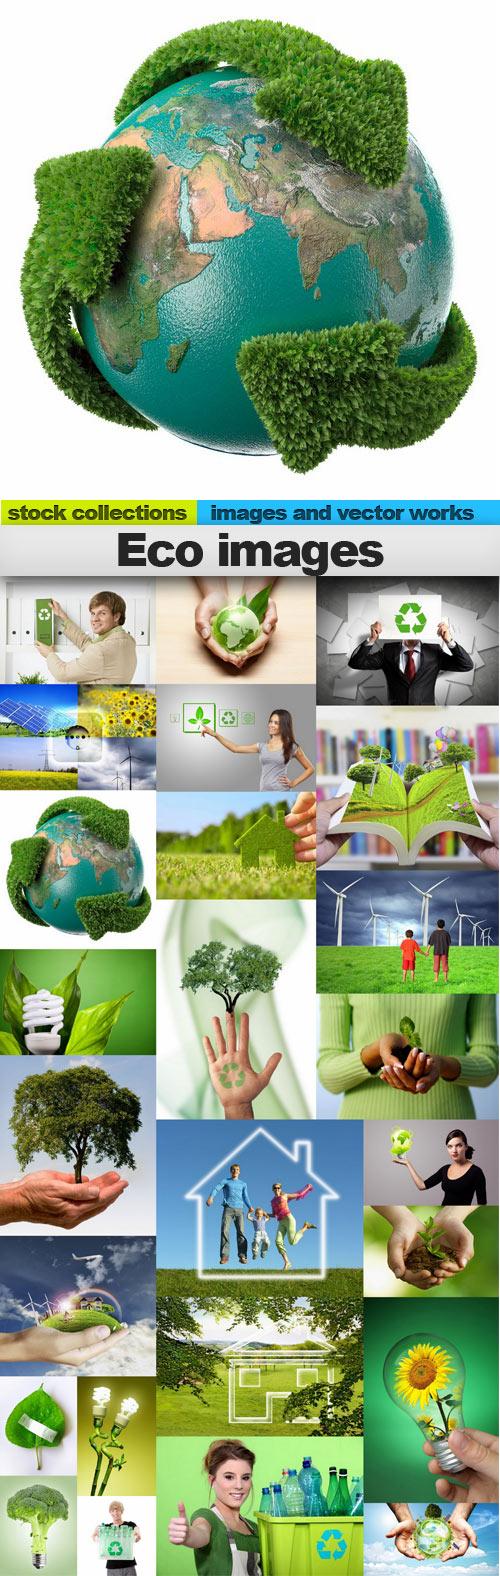 Eco images,25 x UHQ JPEG